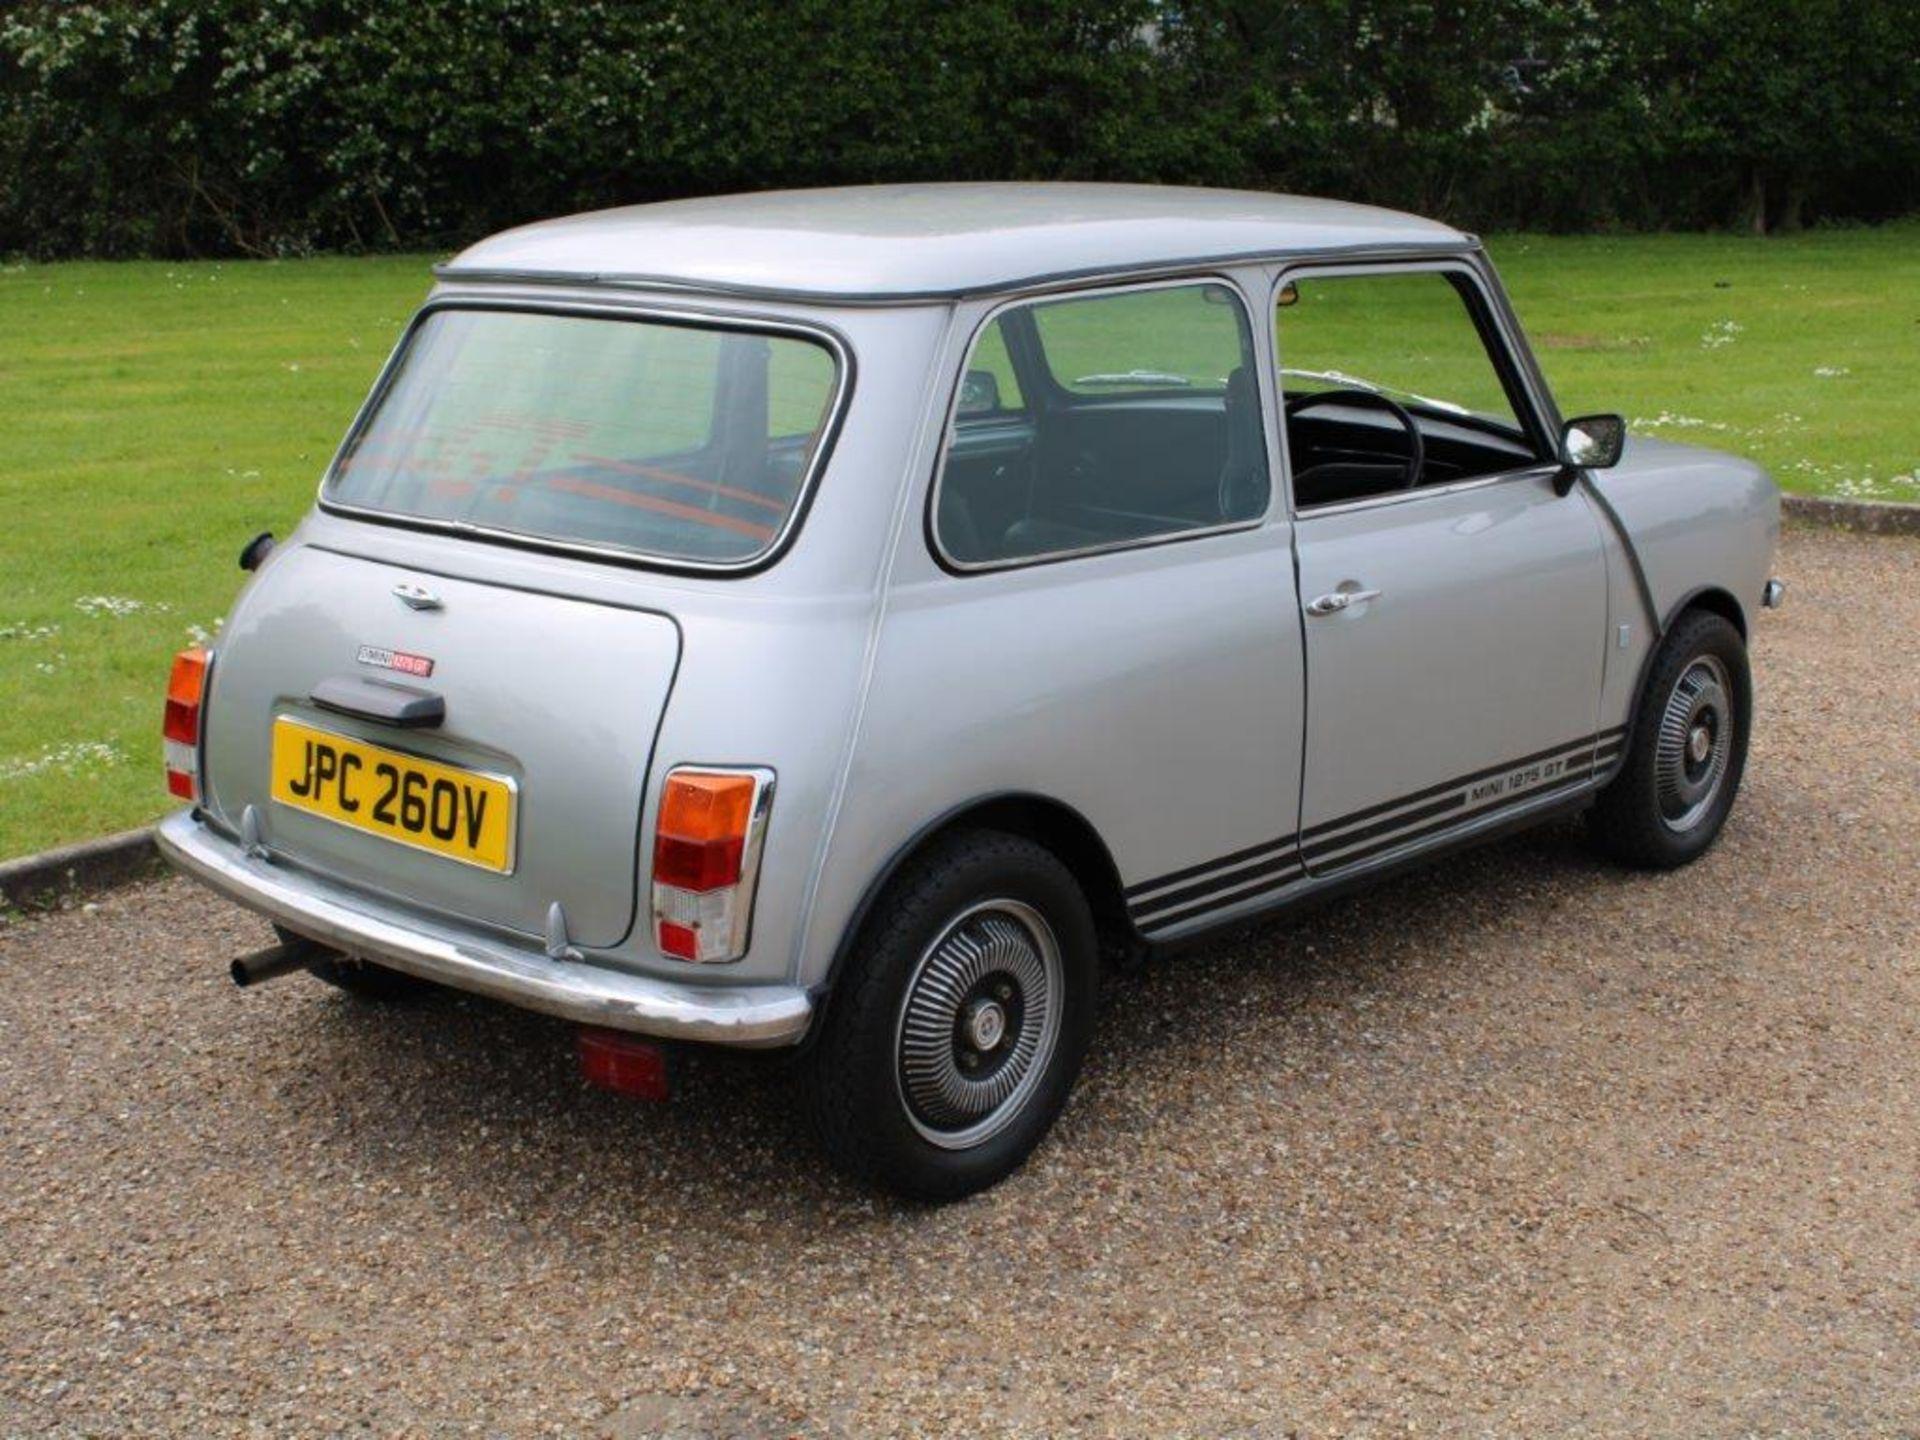 1980 Austin Morris Mini 1275 GT - Image 2 of 28